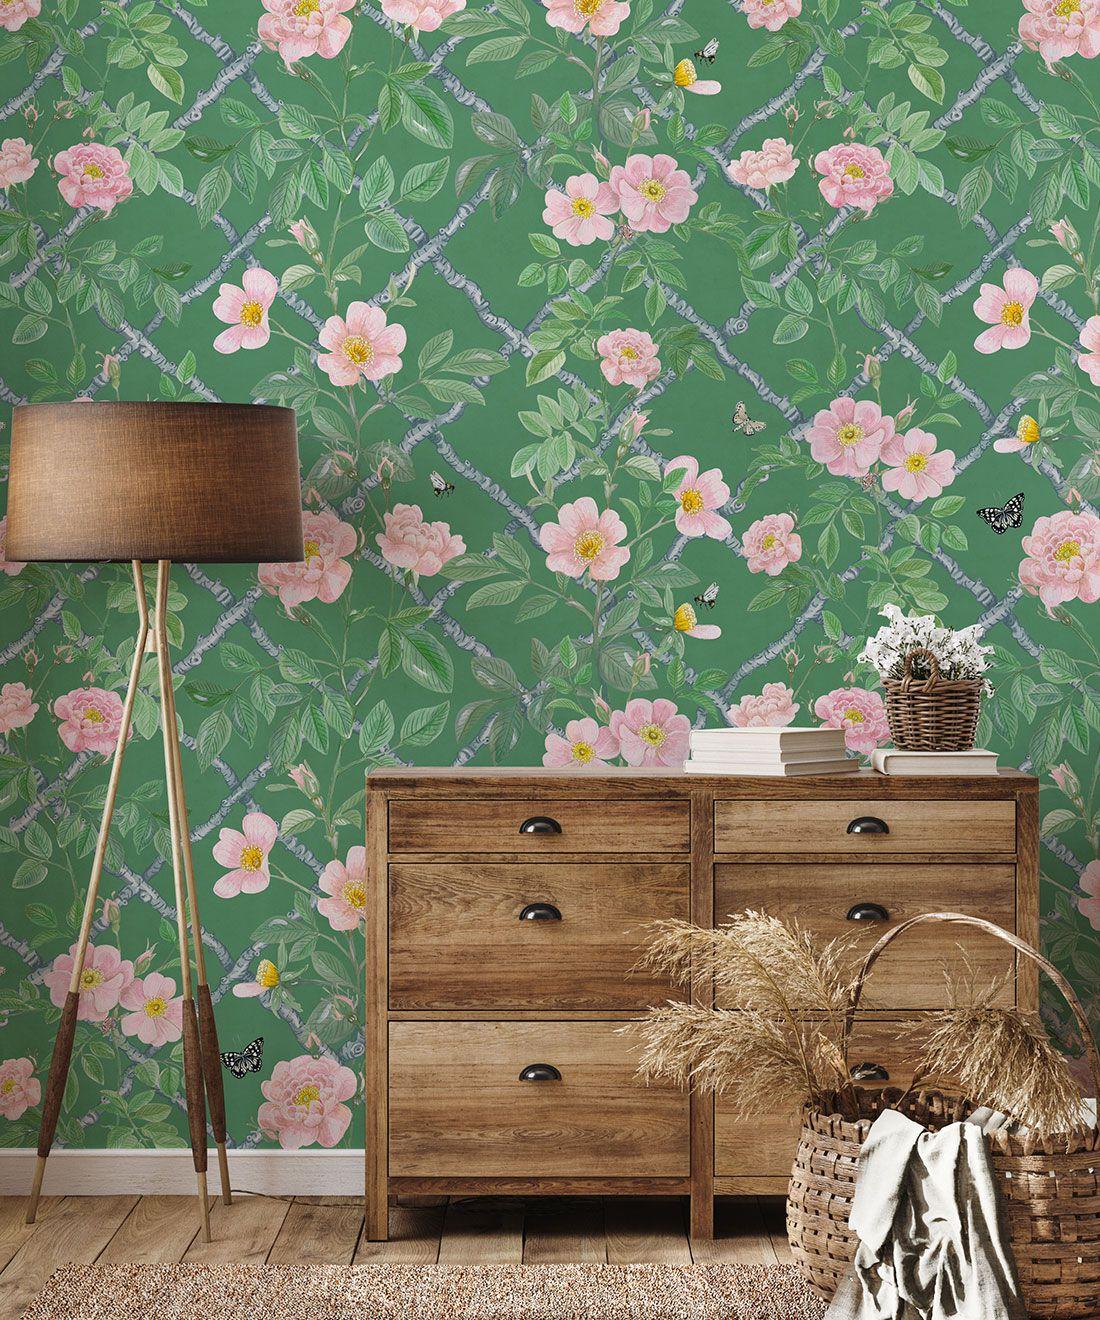 Treilage Wallpaper • Floral Wallpaper • Forest Green • Insitu